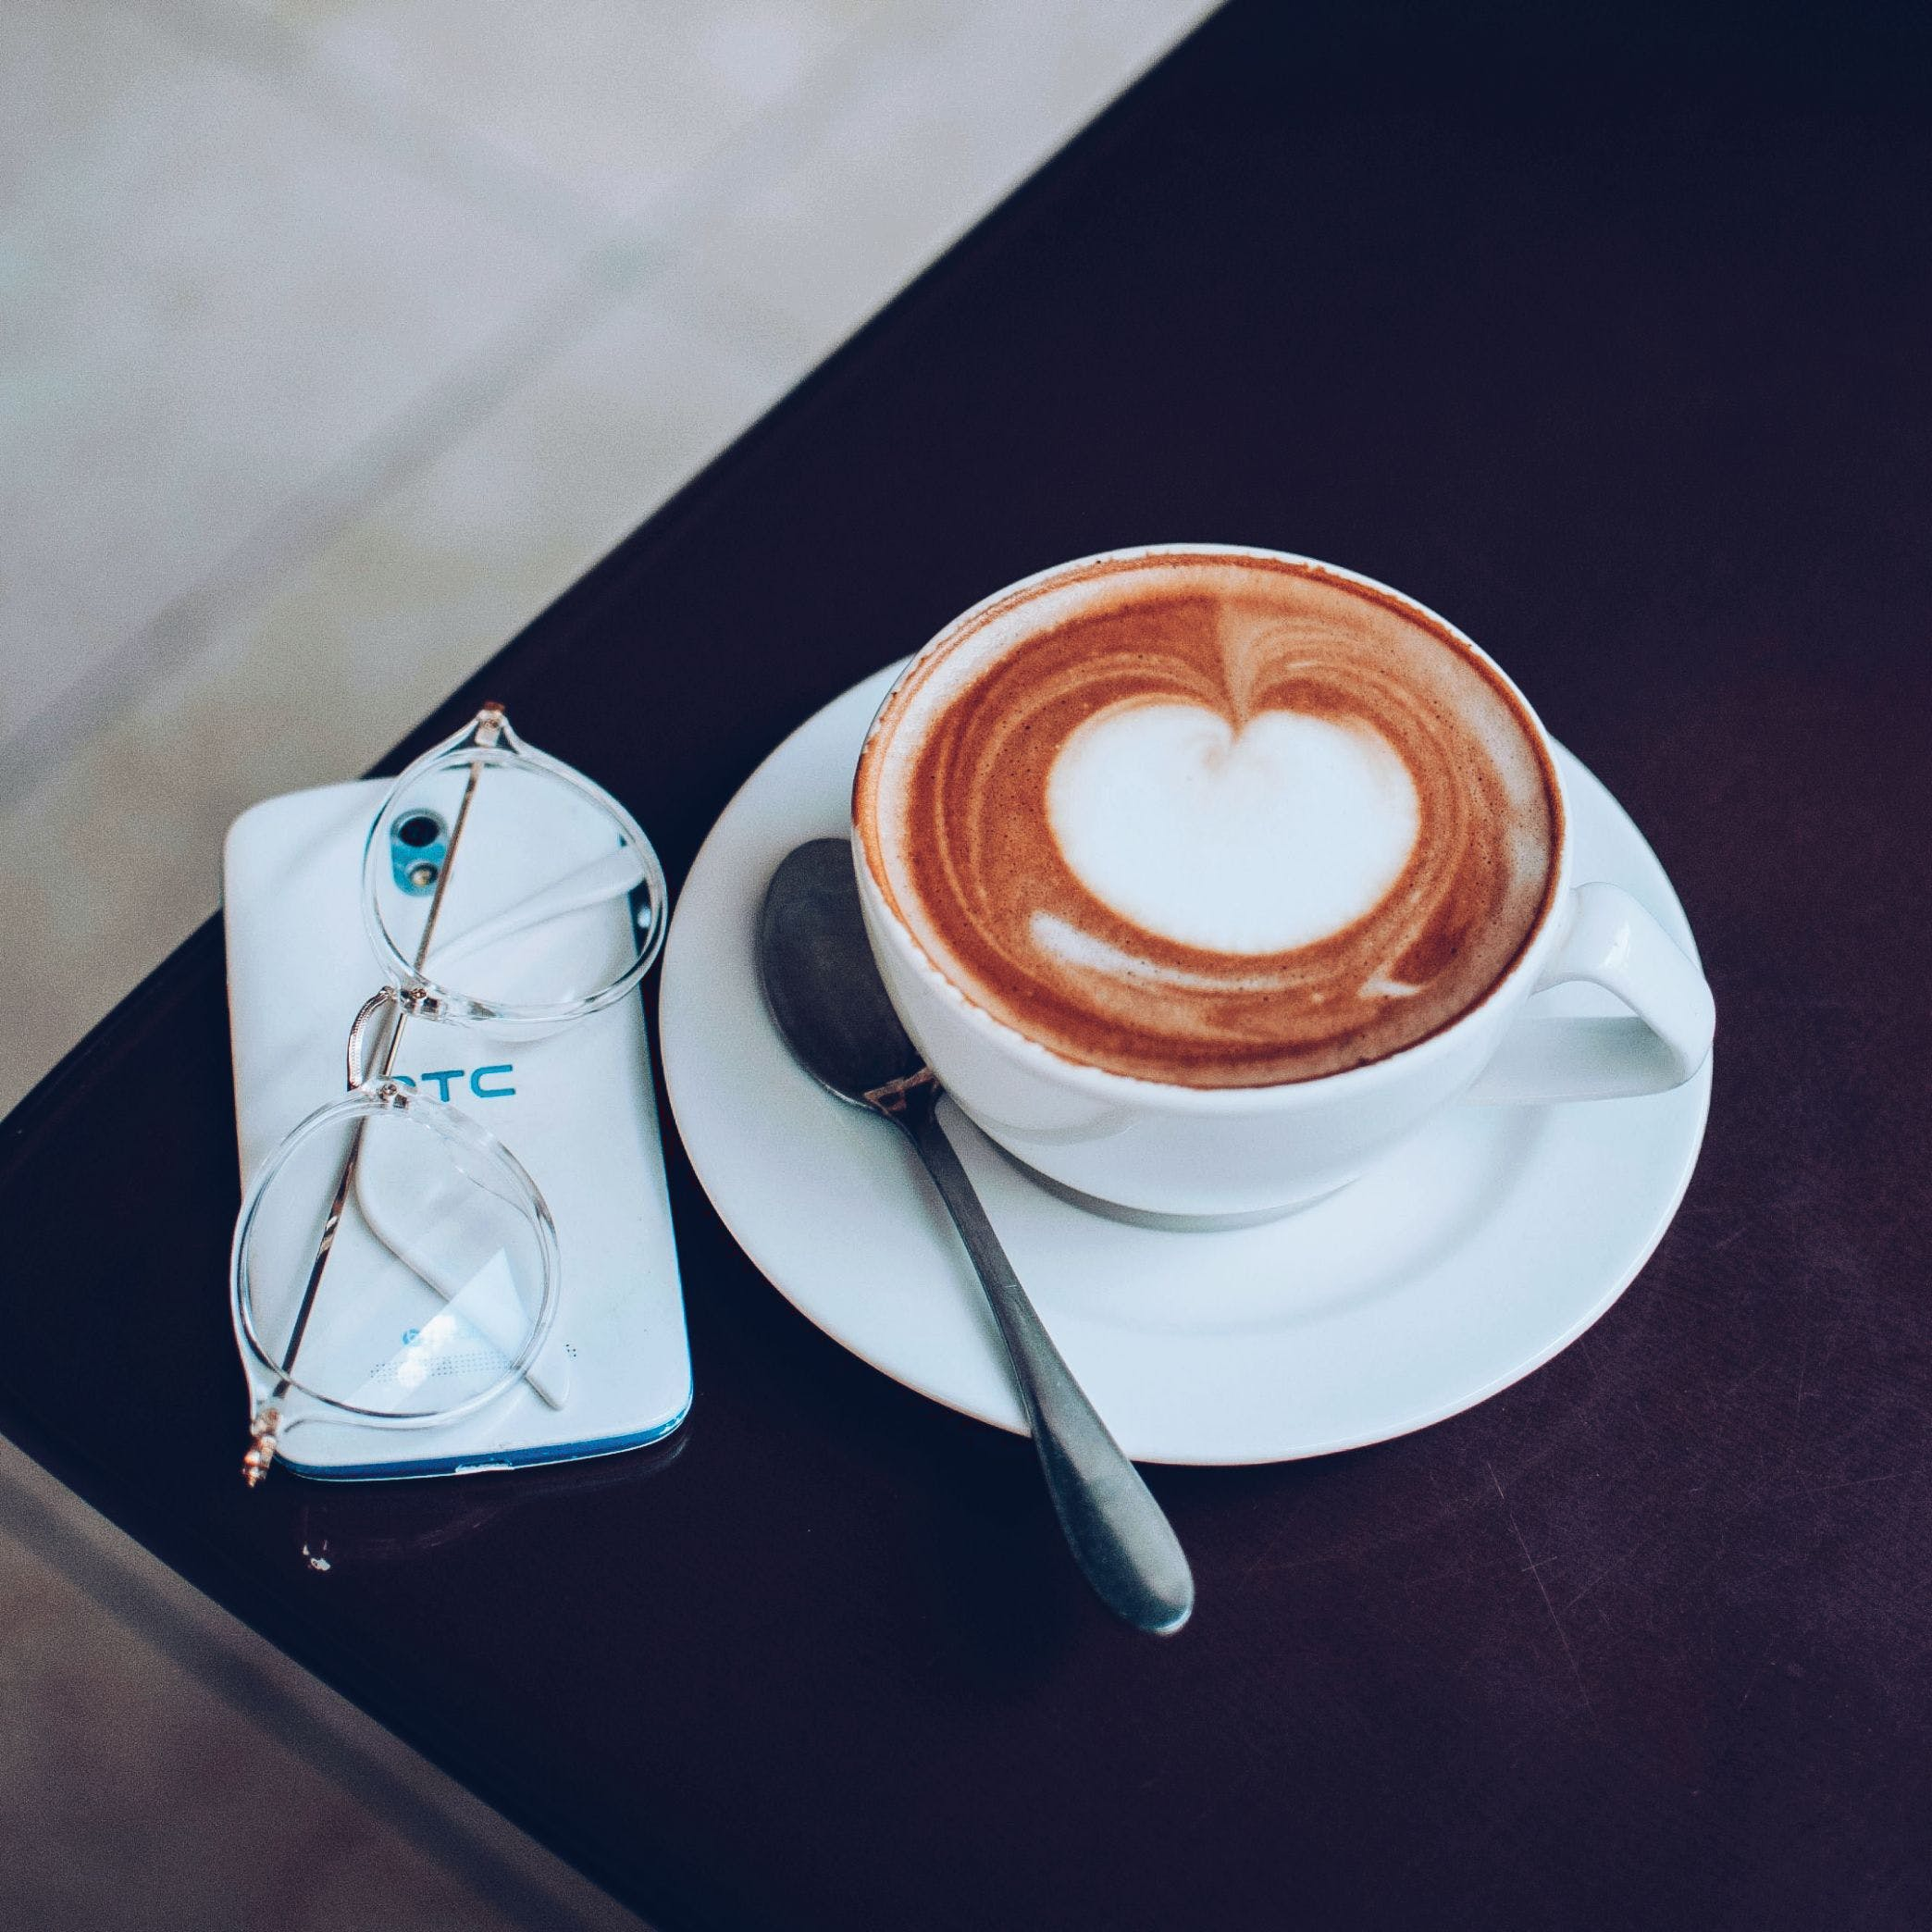 Espresso Cup Near Htc Smartphone